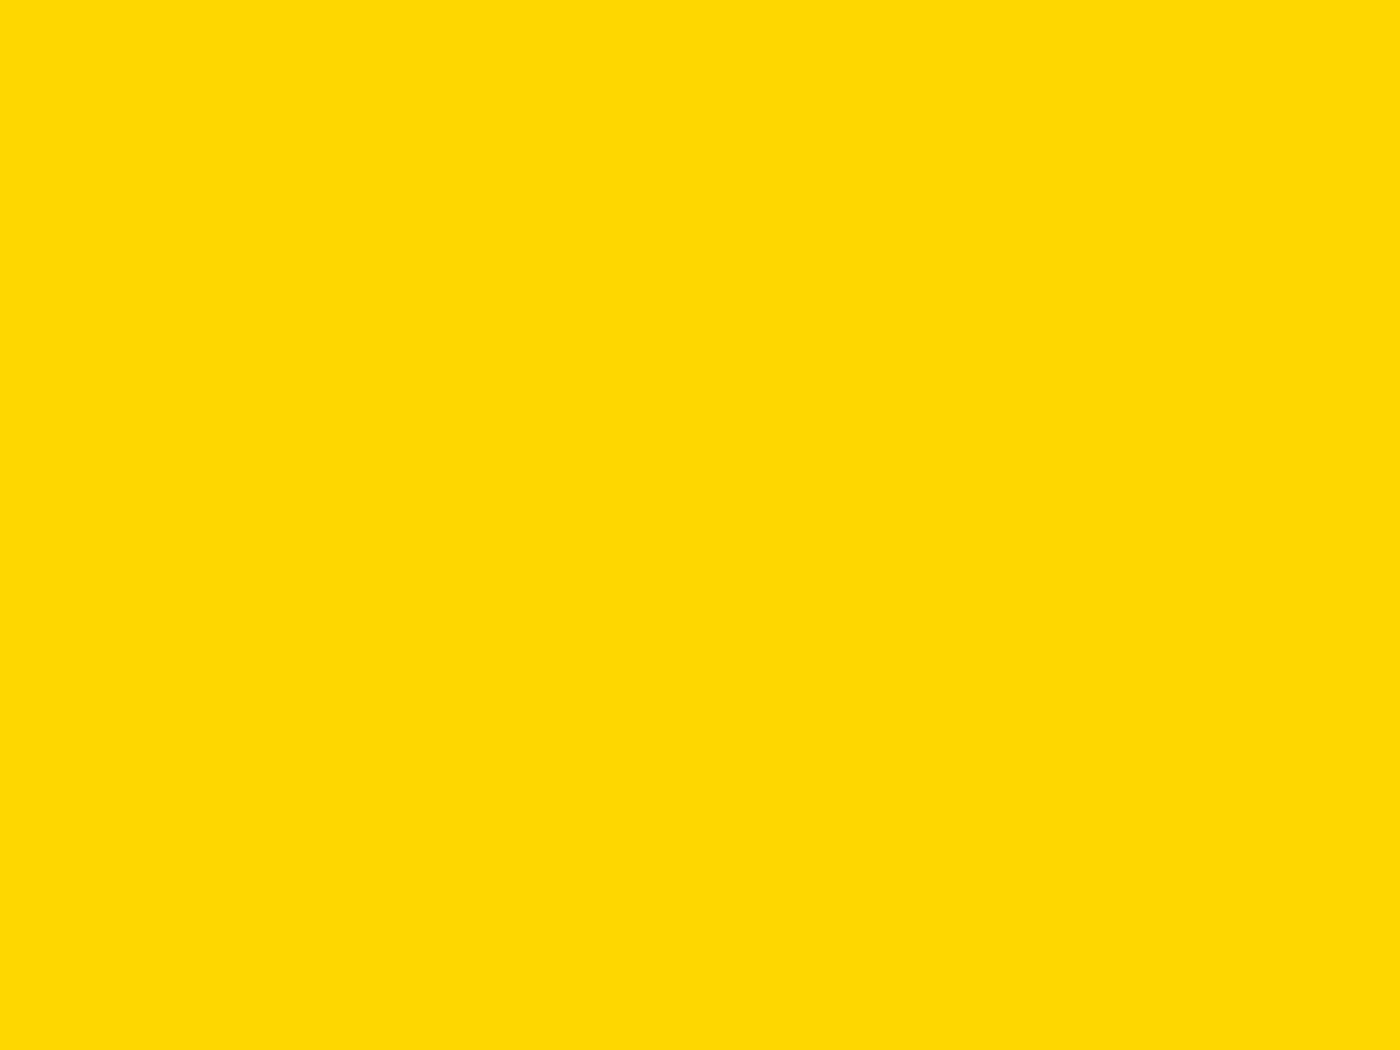 1400x1050 Gold Web Golden Solid Color Background